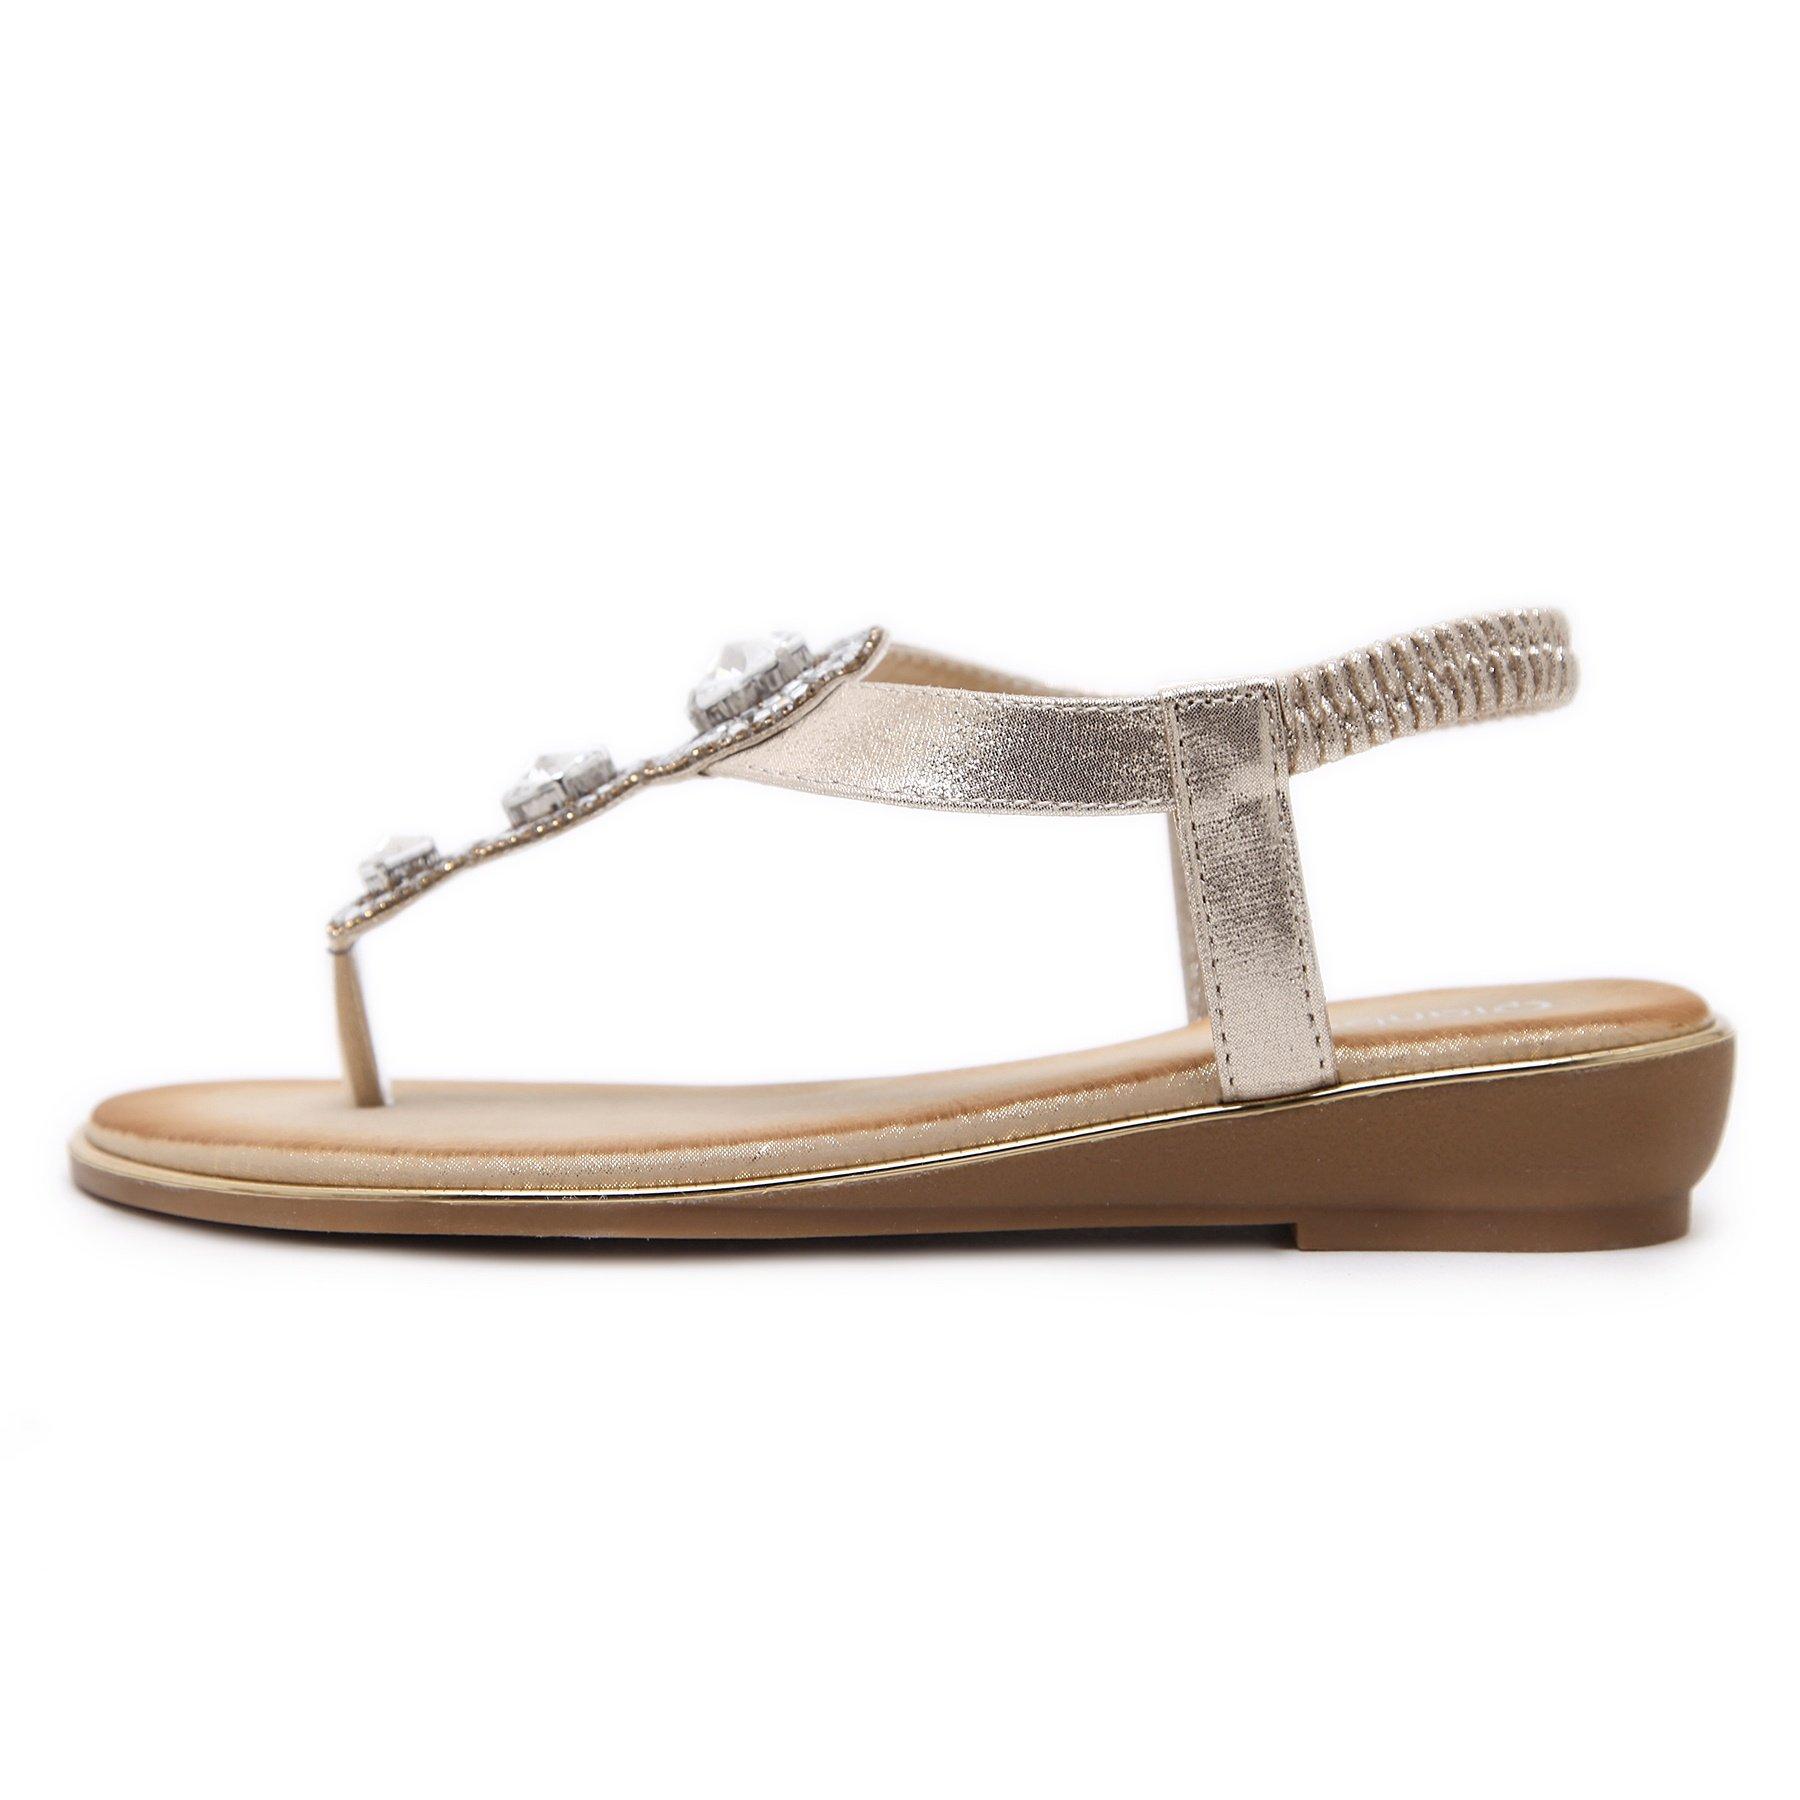 Meeshine Womens Flat Sandals Summer Rhinestone Comfort Bohemian Flip Flop Shoes Gold-02 US 8.5 by Meeshine (Image #2)